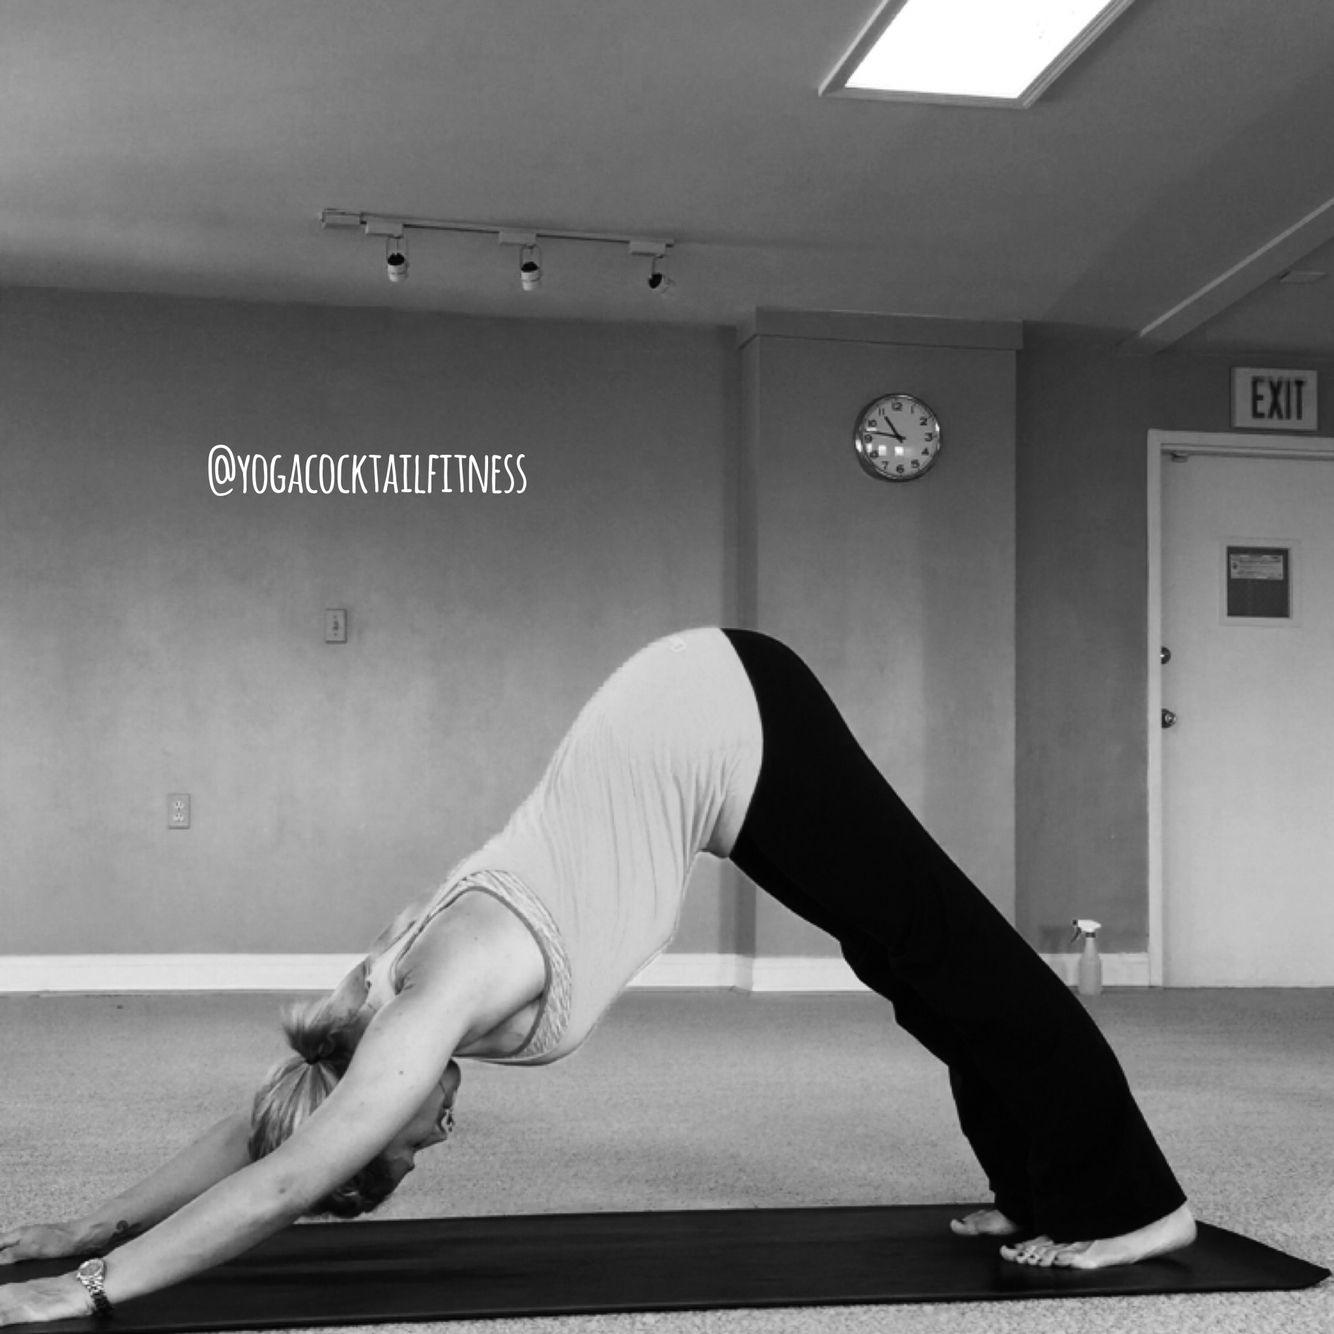 Today's #loveyourasana pose chosen by the lovely @__fitmiss is down ward facing dog or adho mukha svanasana. #yoga #yogagirl #yogachallenge #yogaeverydamnday #yogacocktailfitness @eat_love_yoga #ccy #baltimore #fellspoint #love #fitnessgirl #fitfam #stretch #igyoga